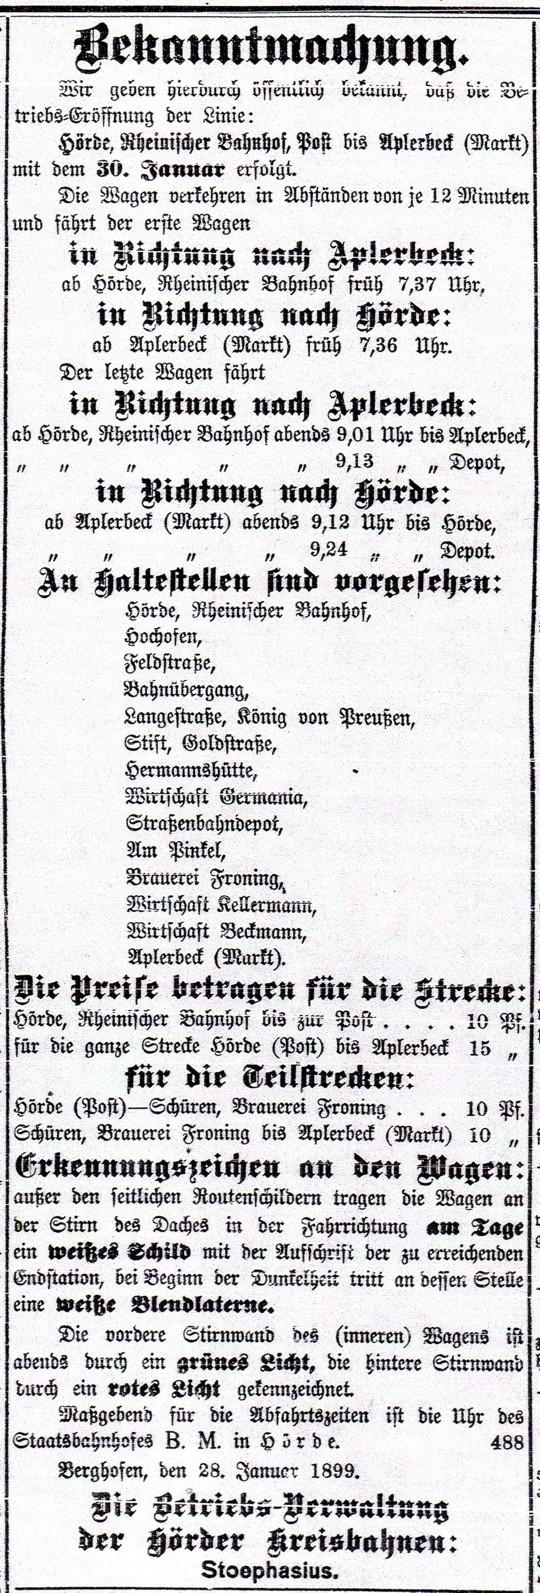 InseratStraßenbahnlinieHördeAplerbeck1899_540x1593